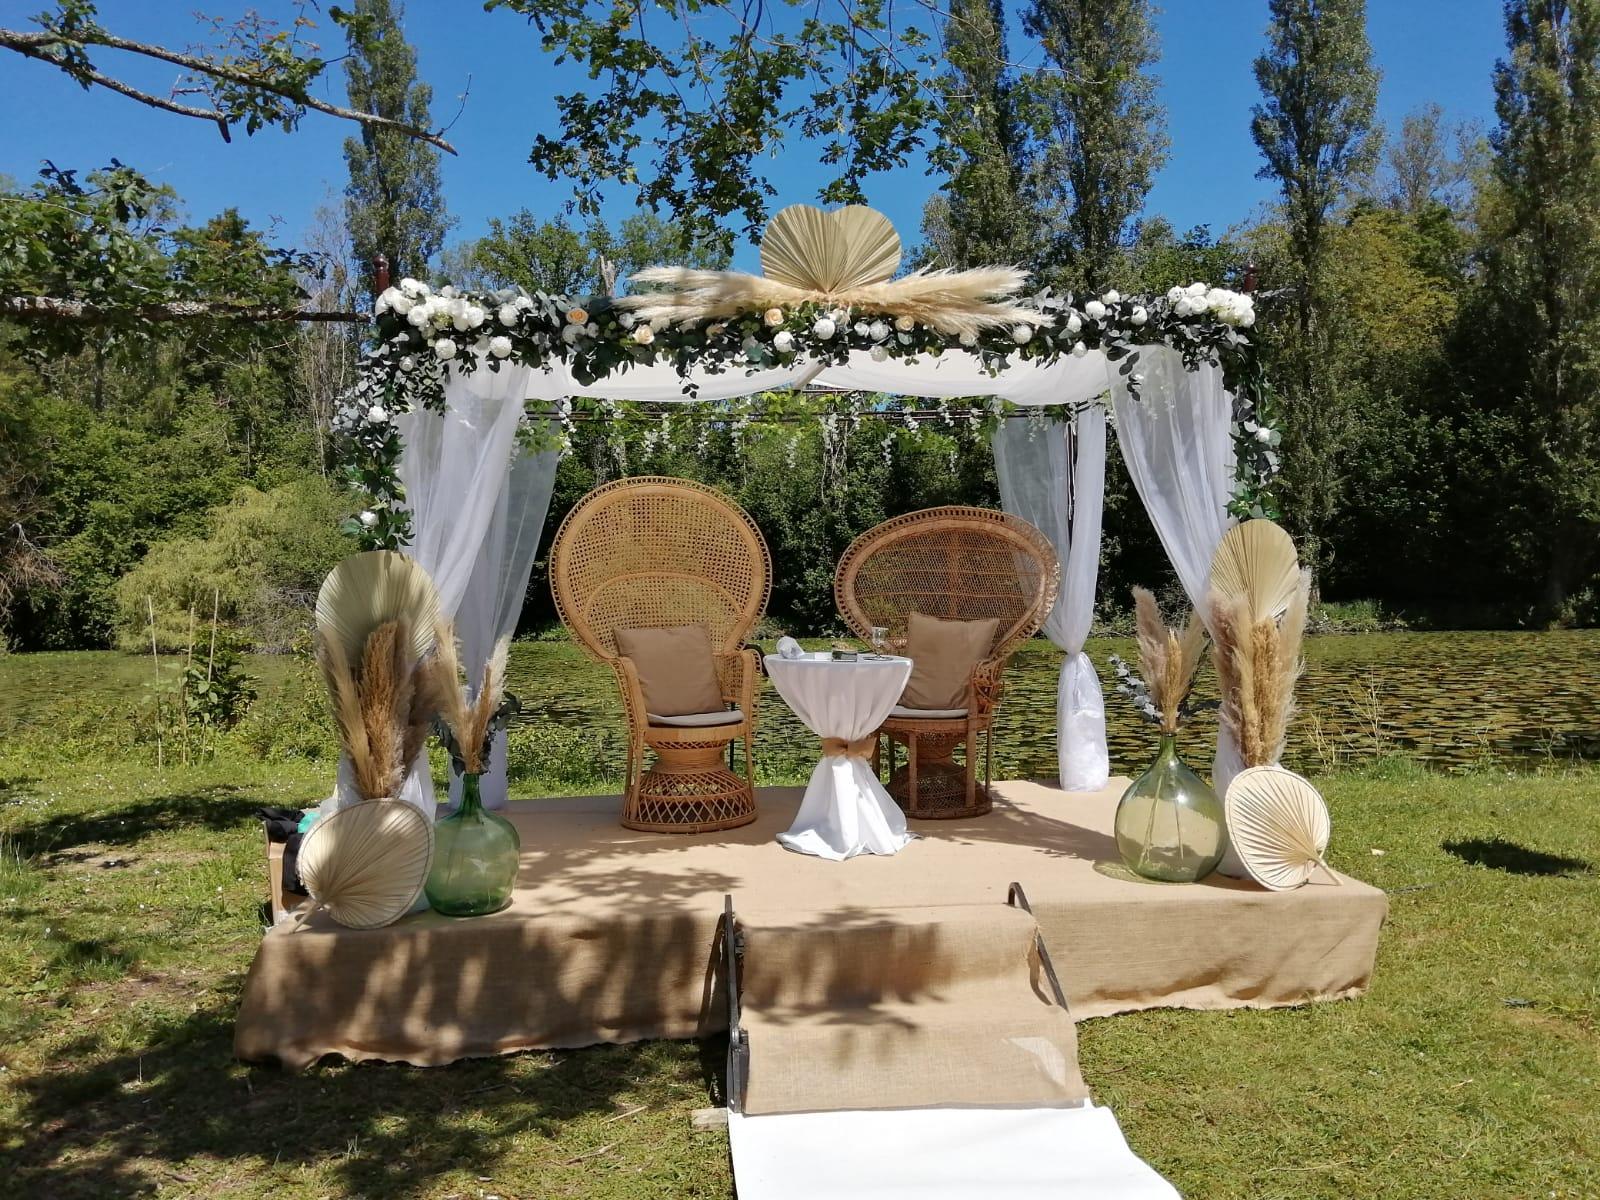 Houppa - Mariage juif - C&D Events - Wedding planner / Organisatrice de mariage dans l'Oise